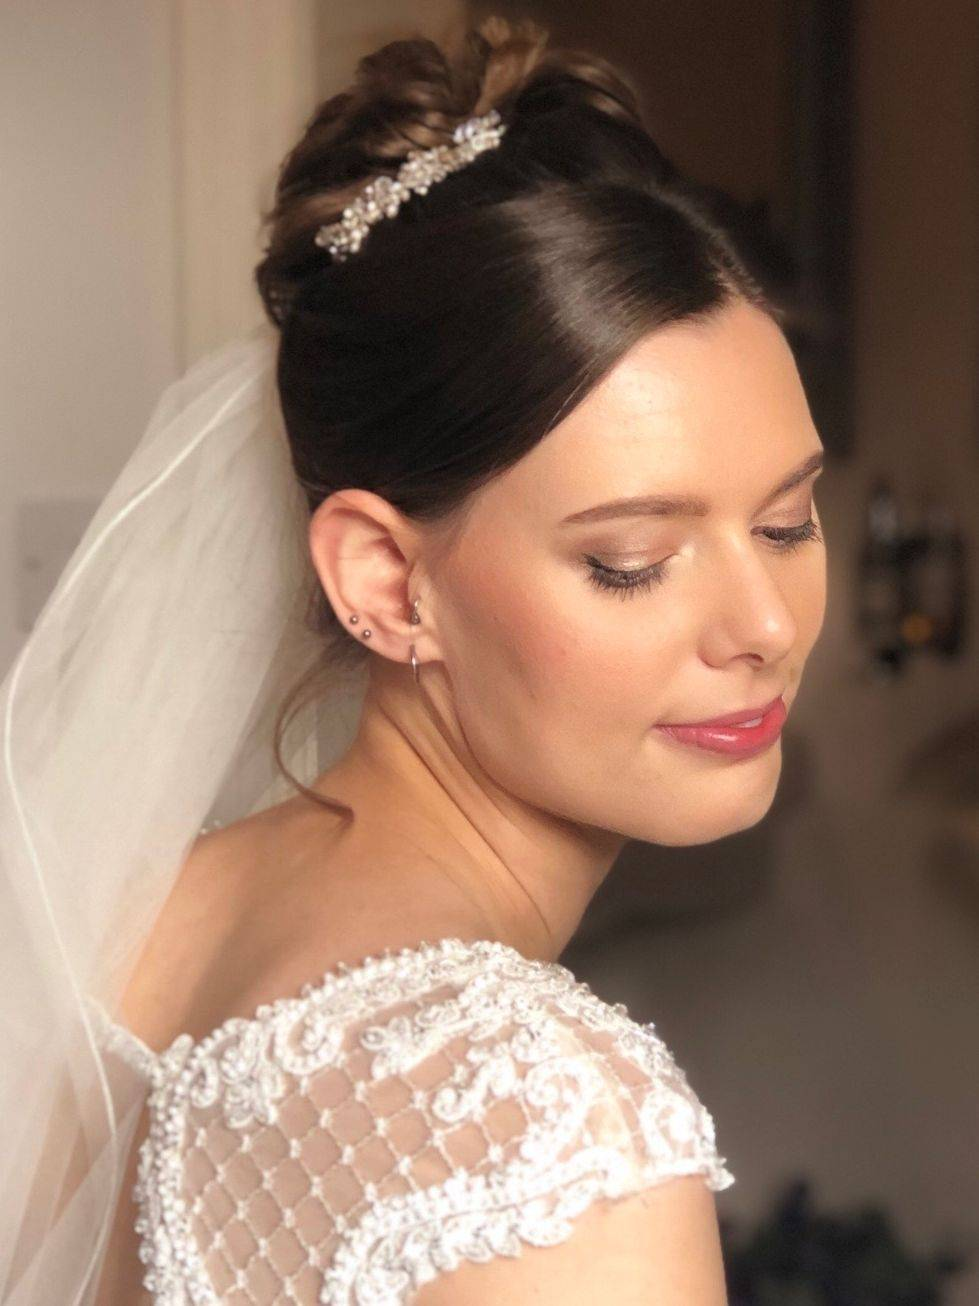 Bridal makeup, wedding makeup, norfolk, suffolk, norwich, great yarmouth